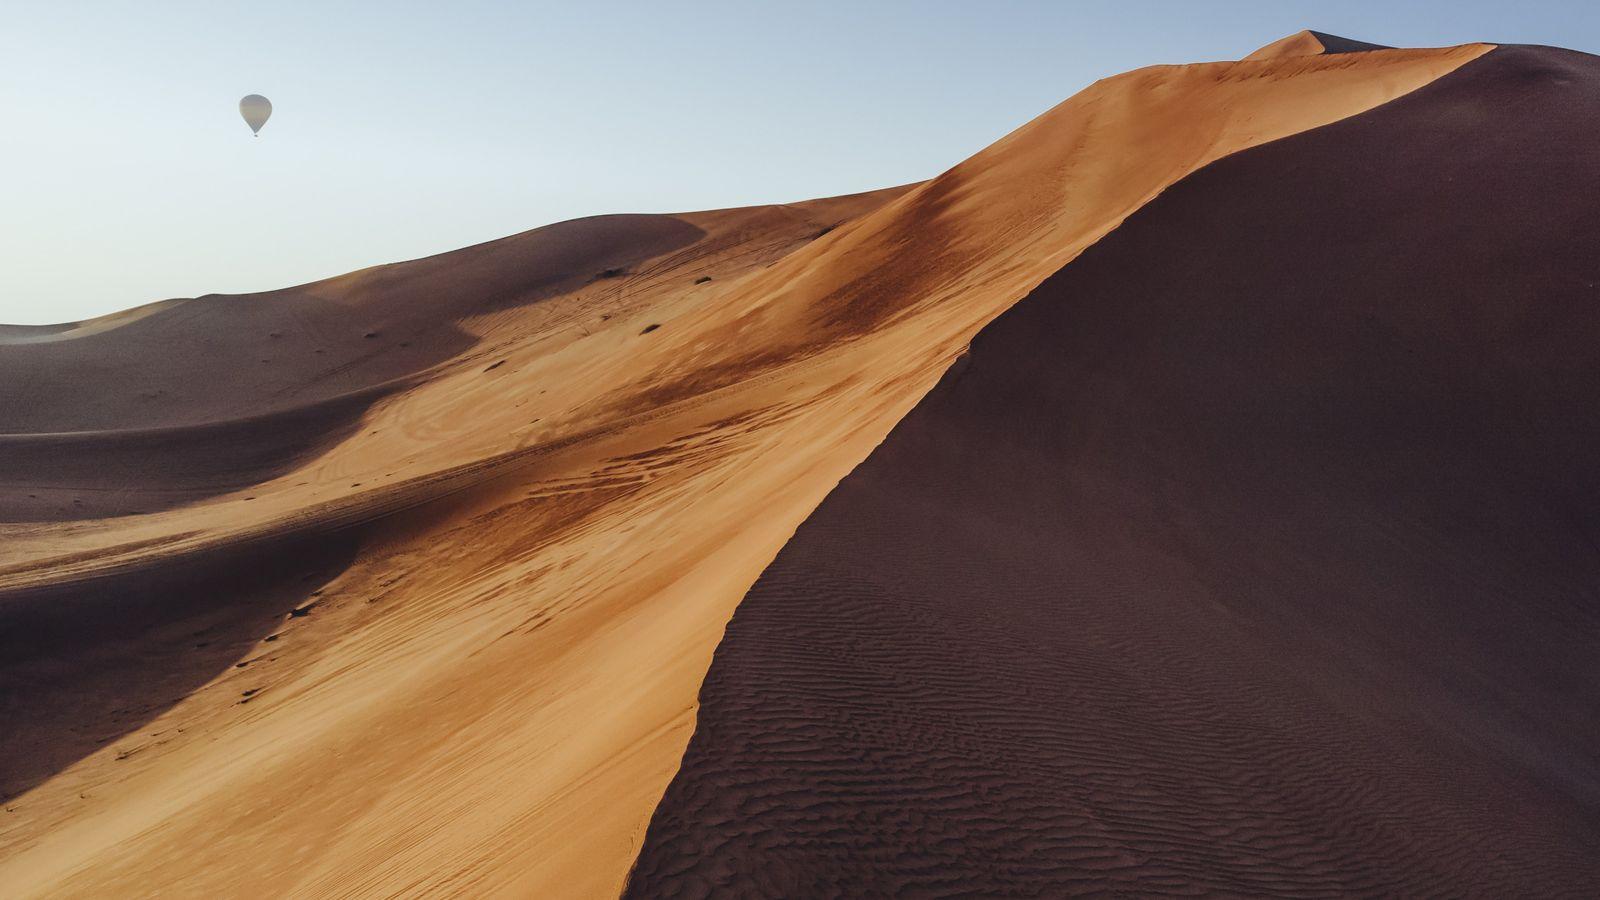 Outdoors activities in Oman, desert hot air balloon ride